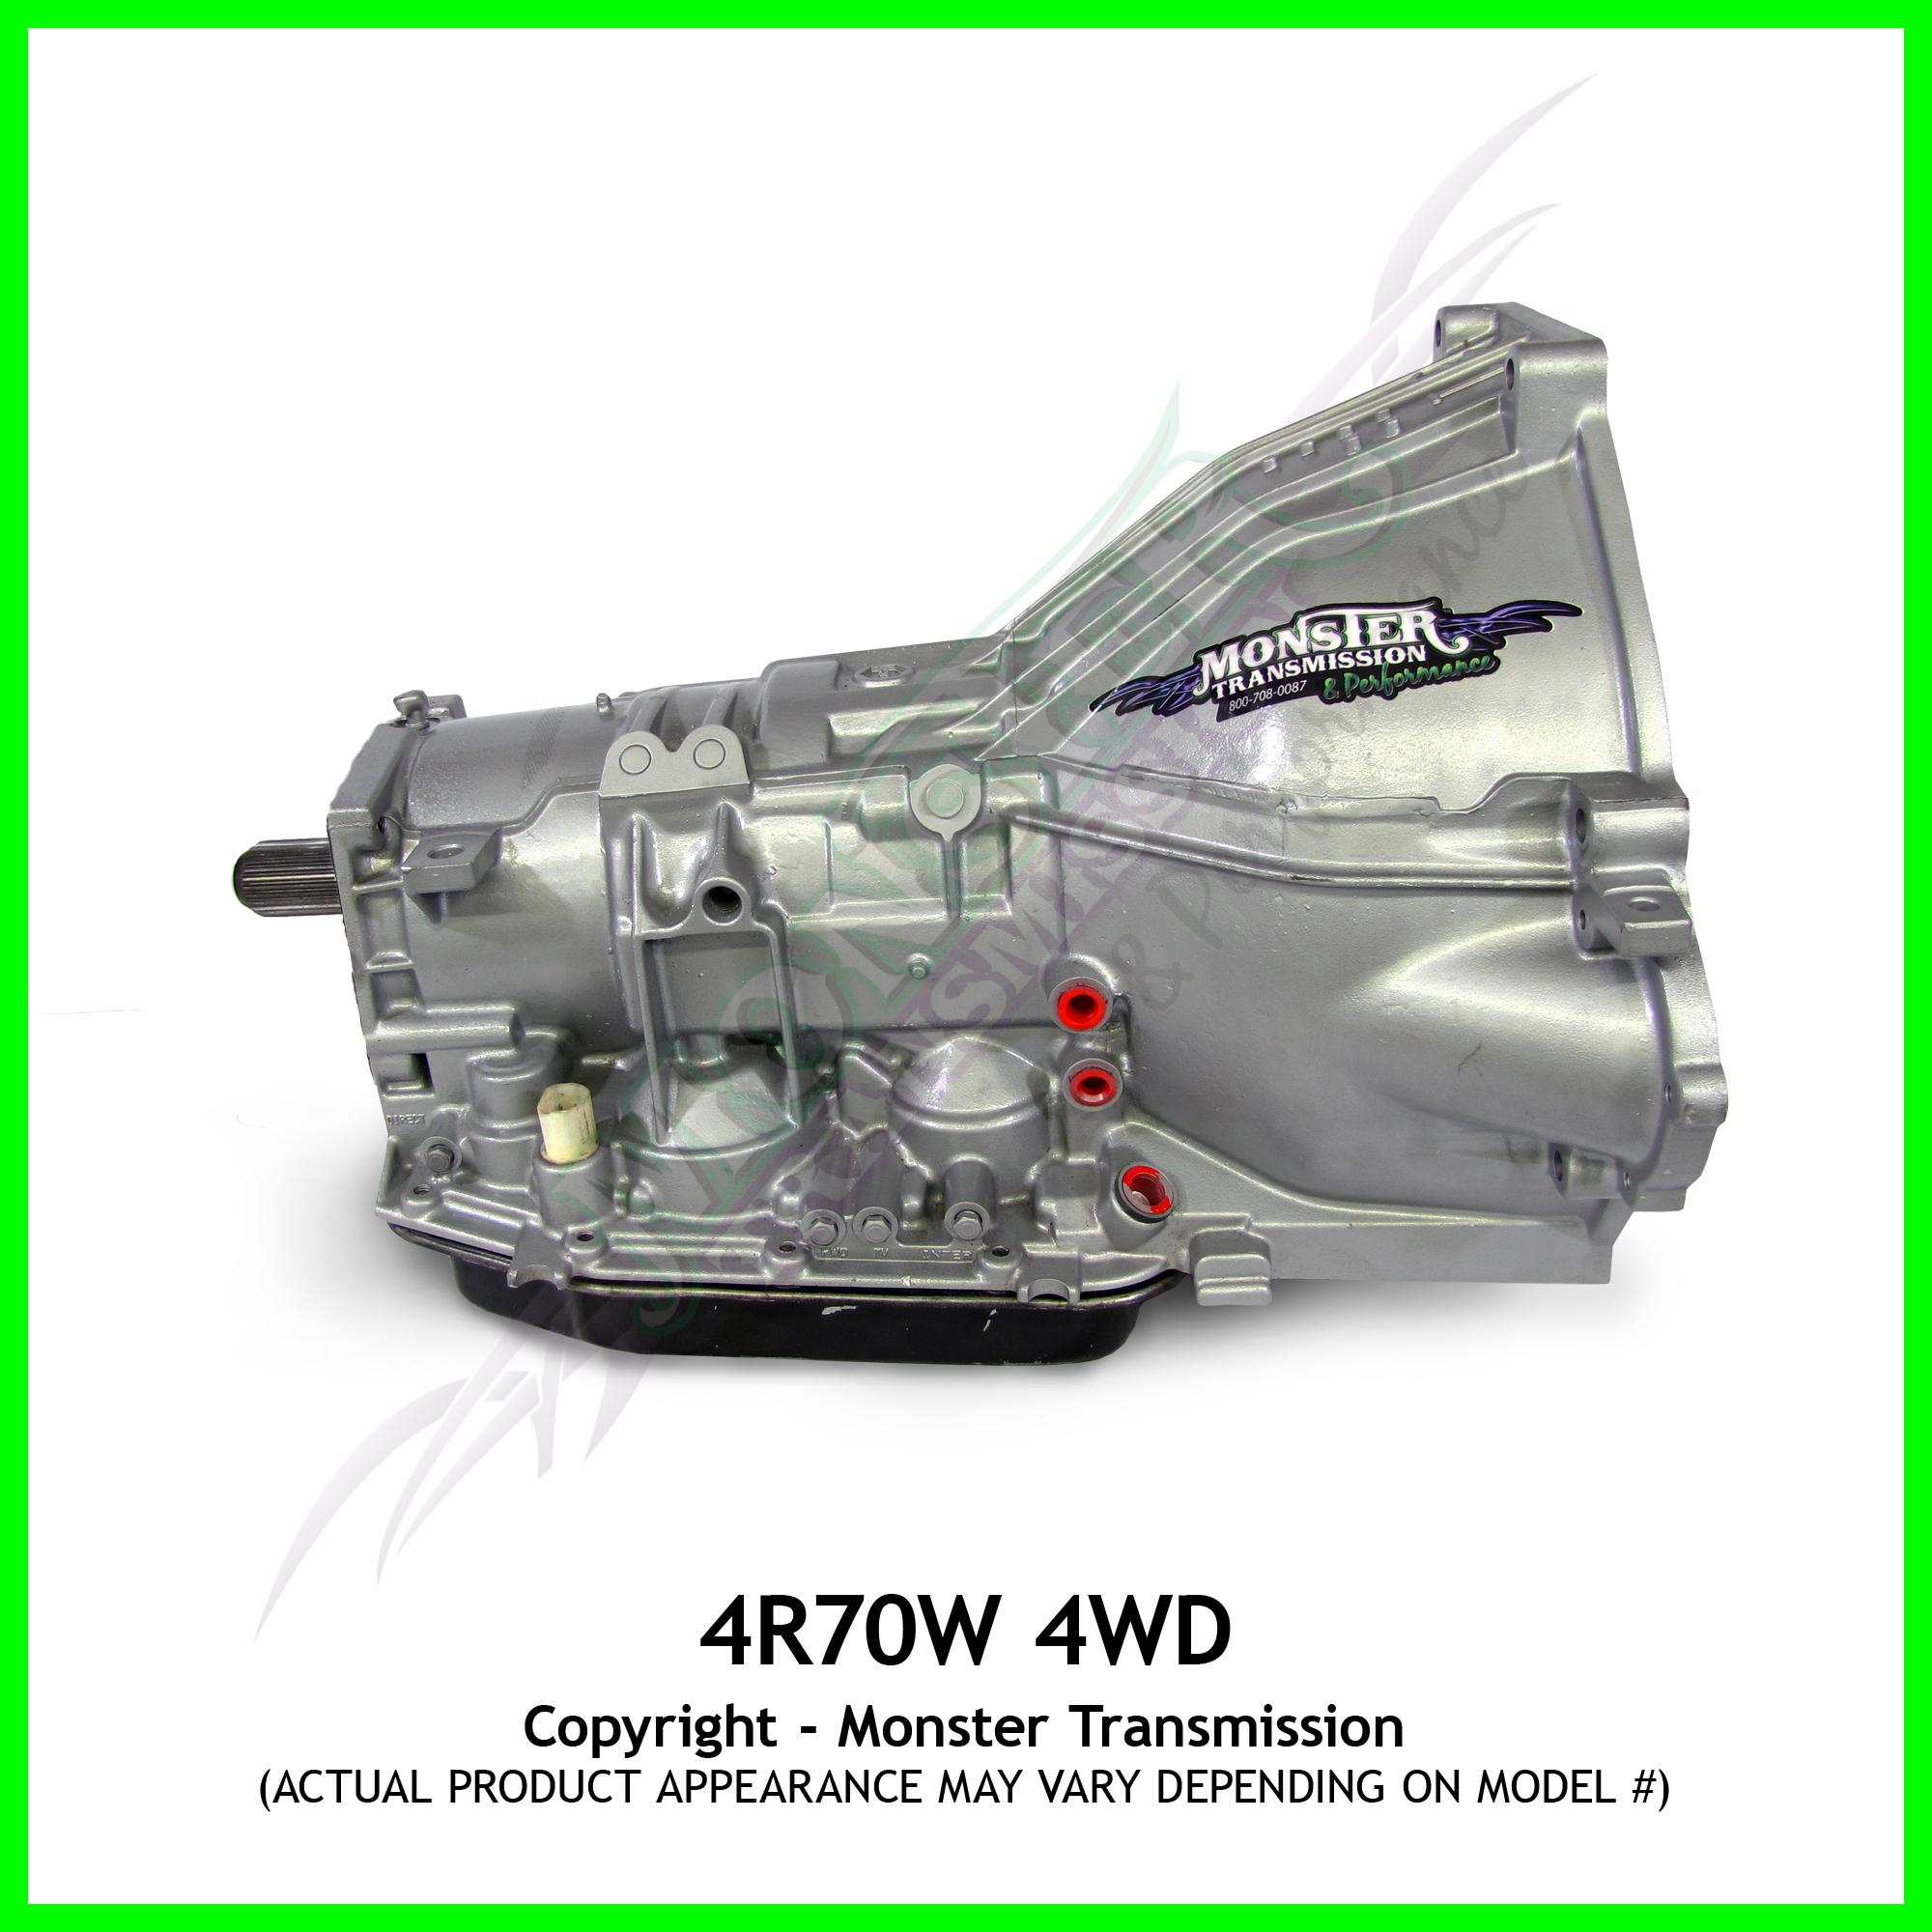 Dodge Dynasty 1993 Transmission Transfer Case: 4R70W Transmission Remanufactured Performance Heavy Duty 4x4